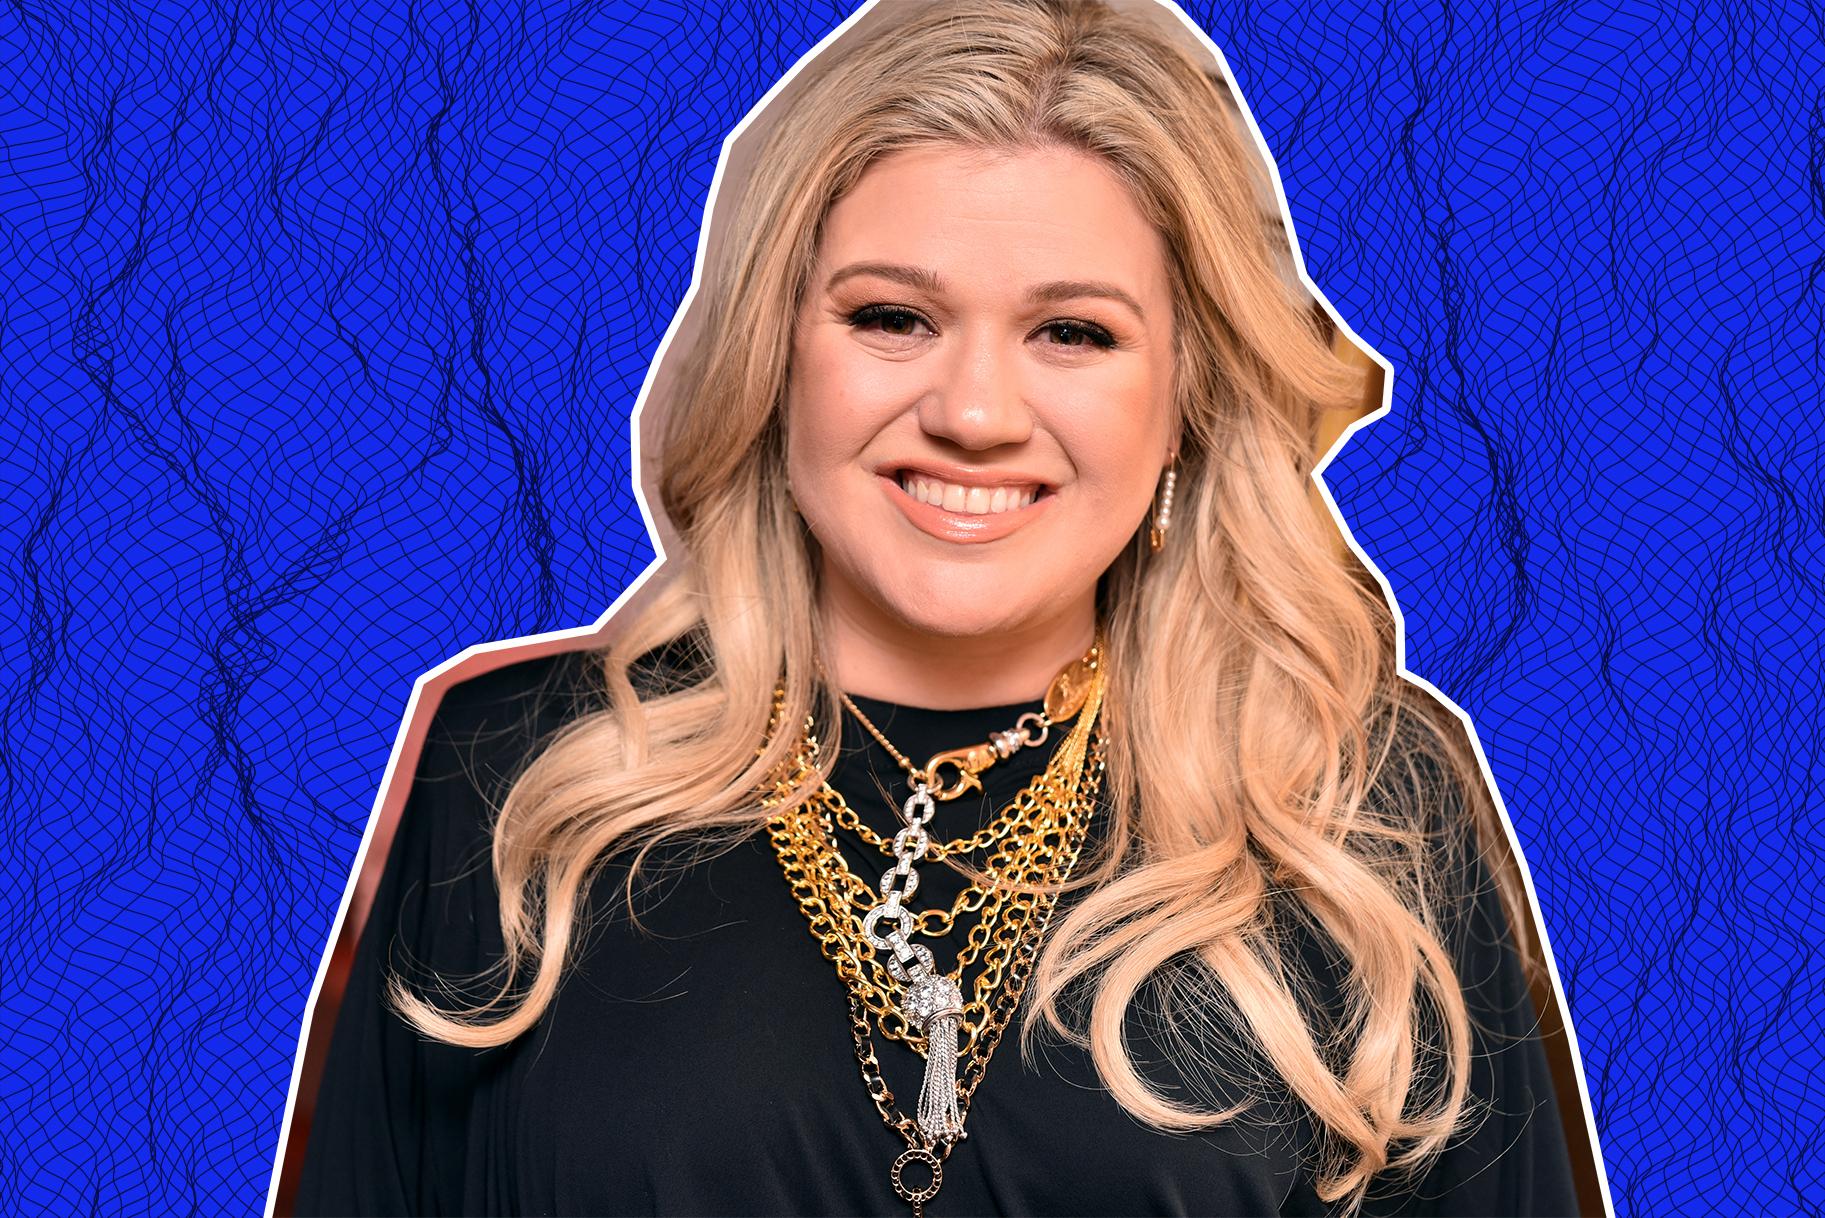 43. Kelly Clarkson